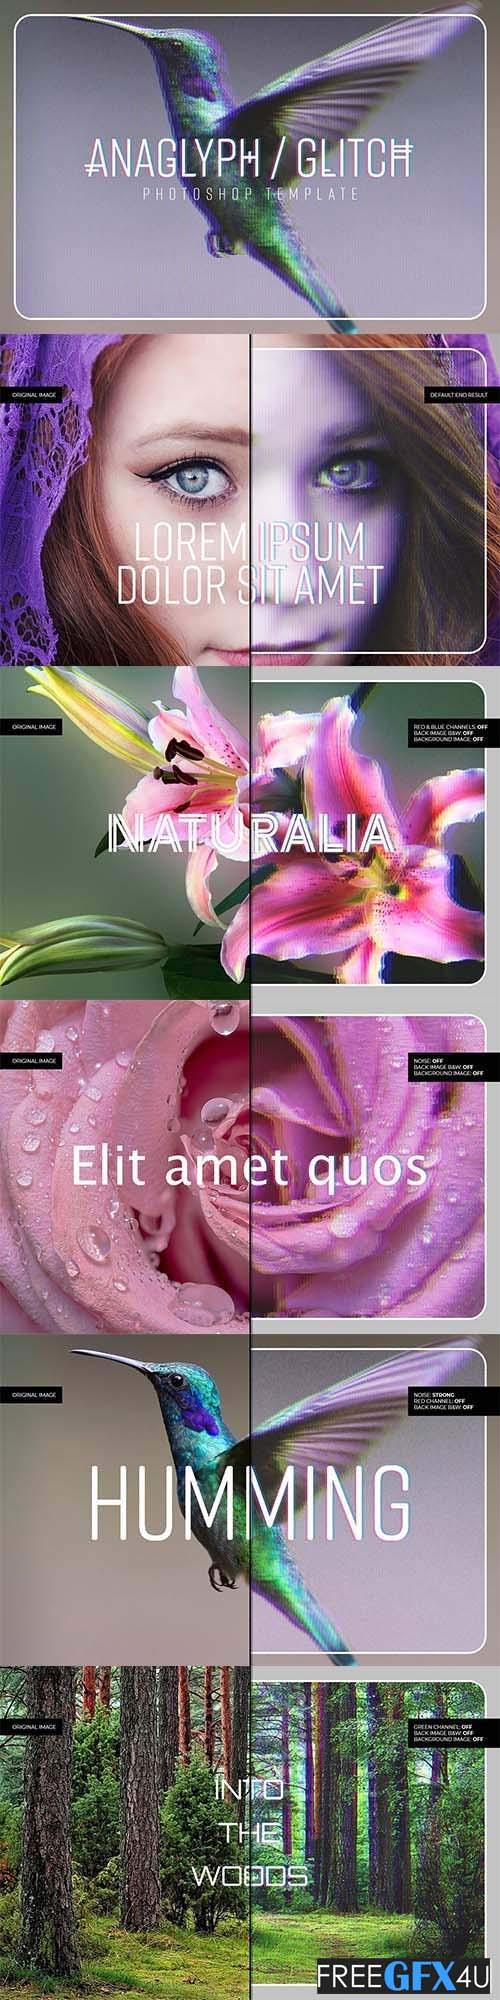 Anaglyph/Glitch Photoshop PSD Template